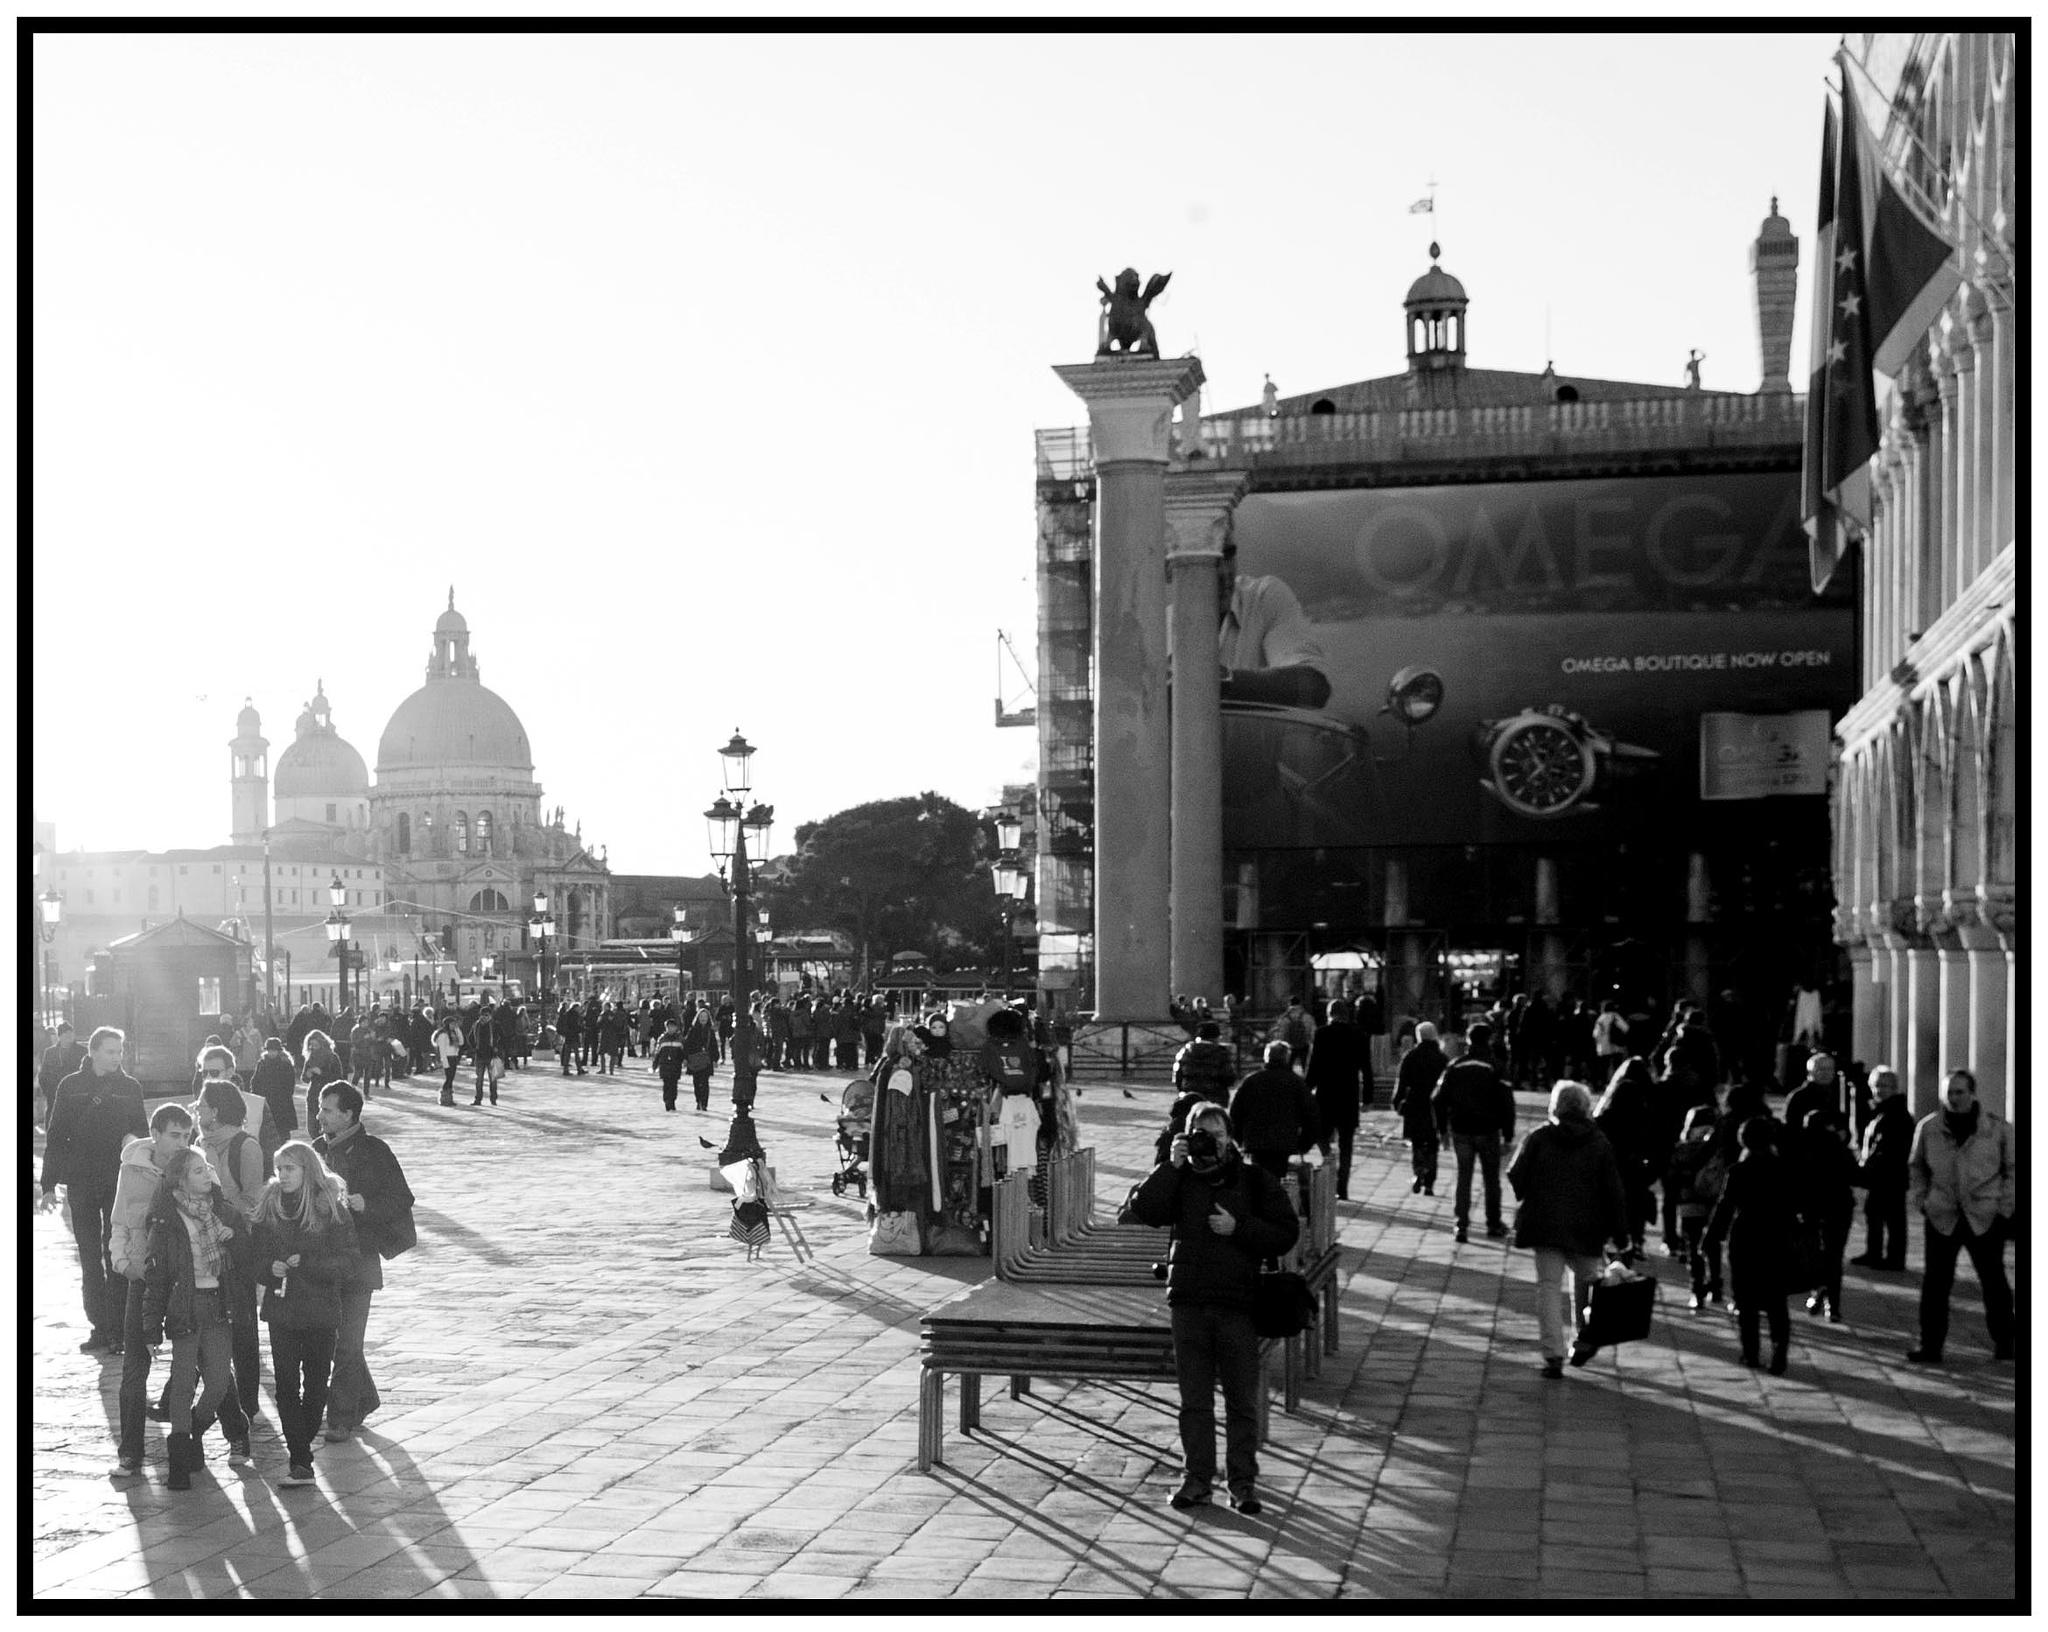 venezia controluce in piazza san marco by bcorech